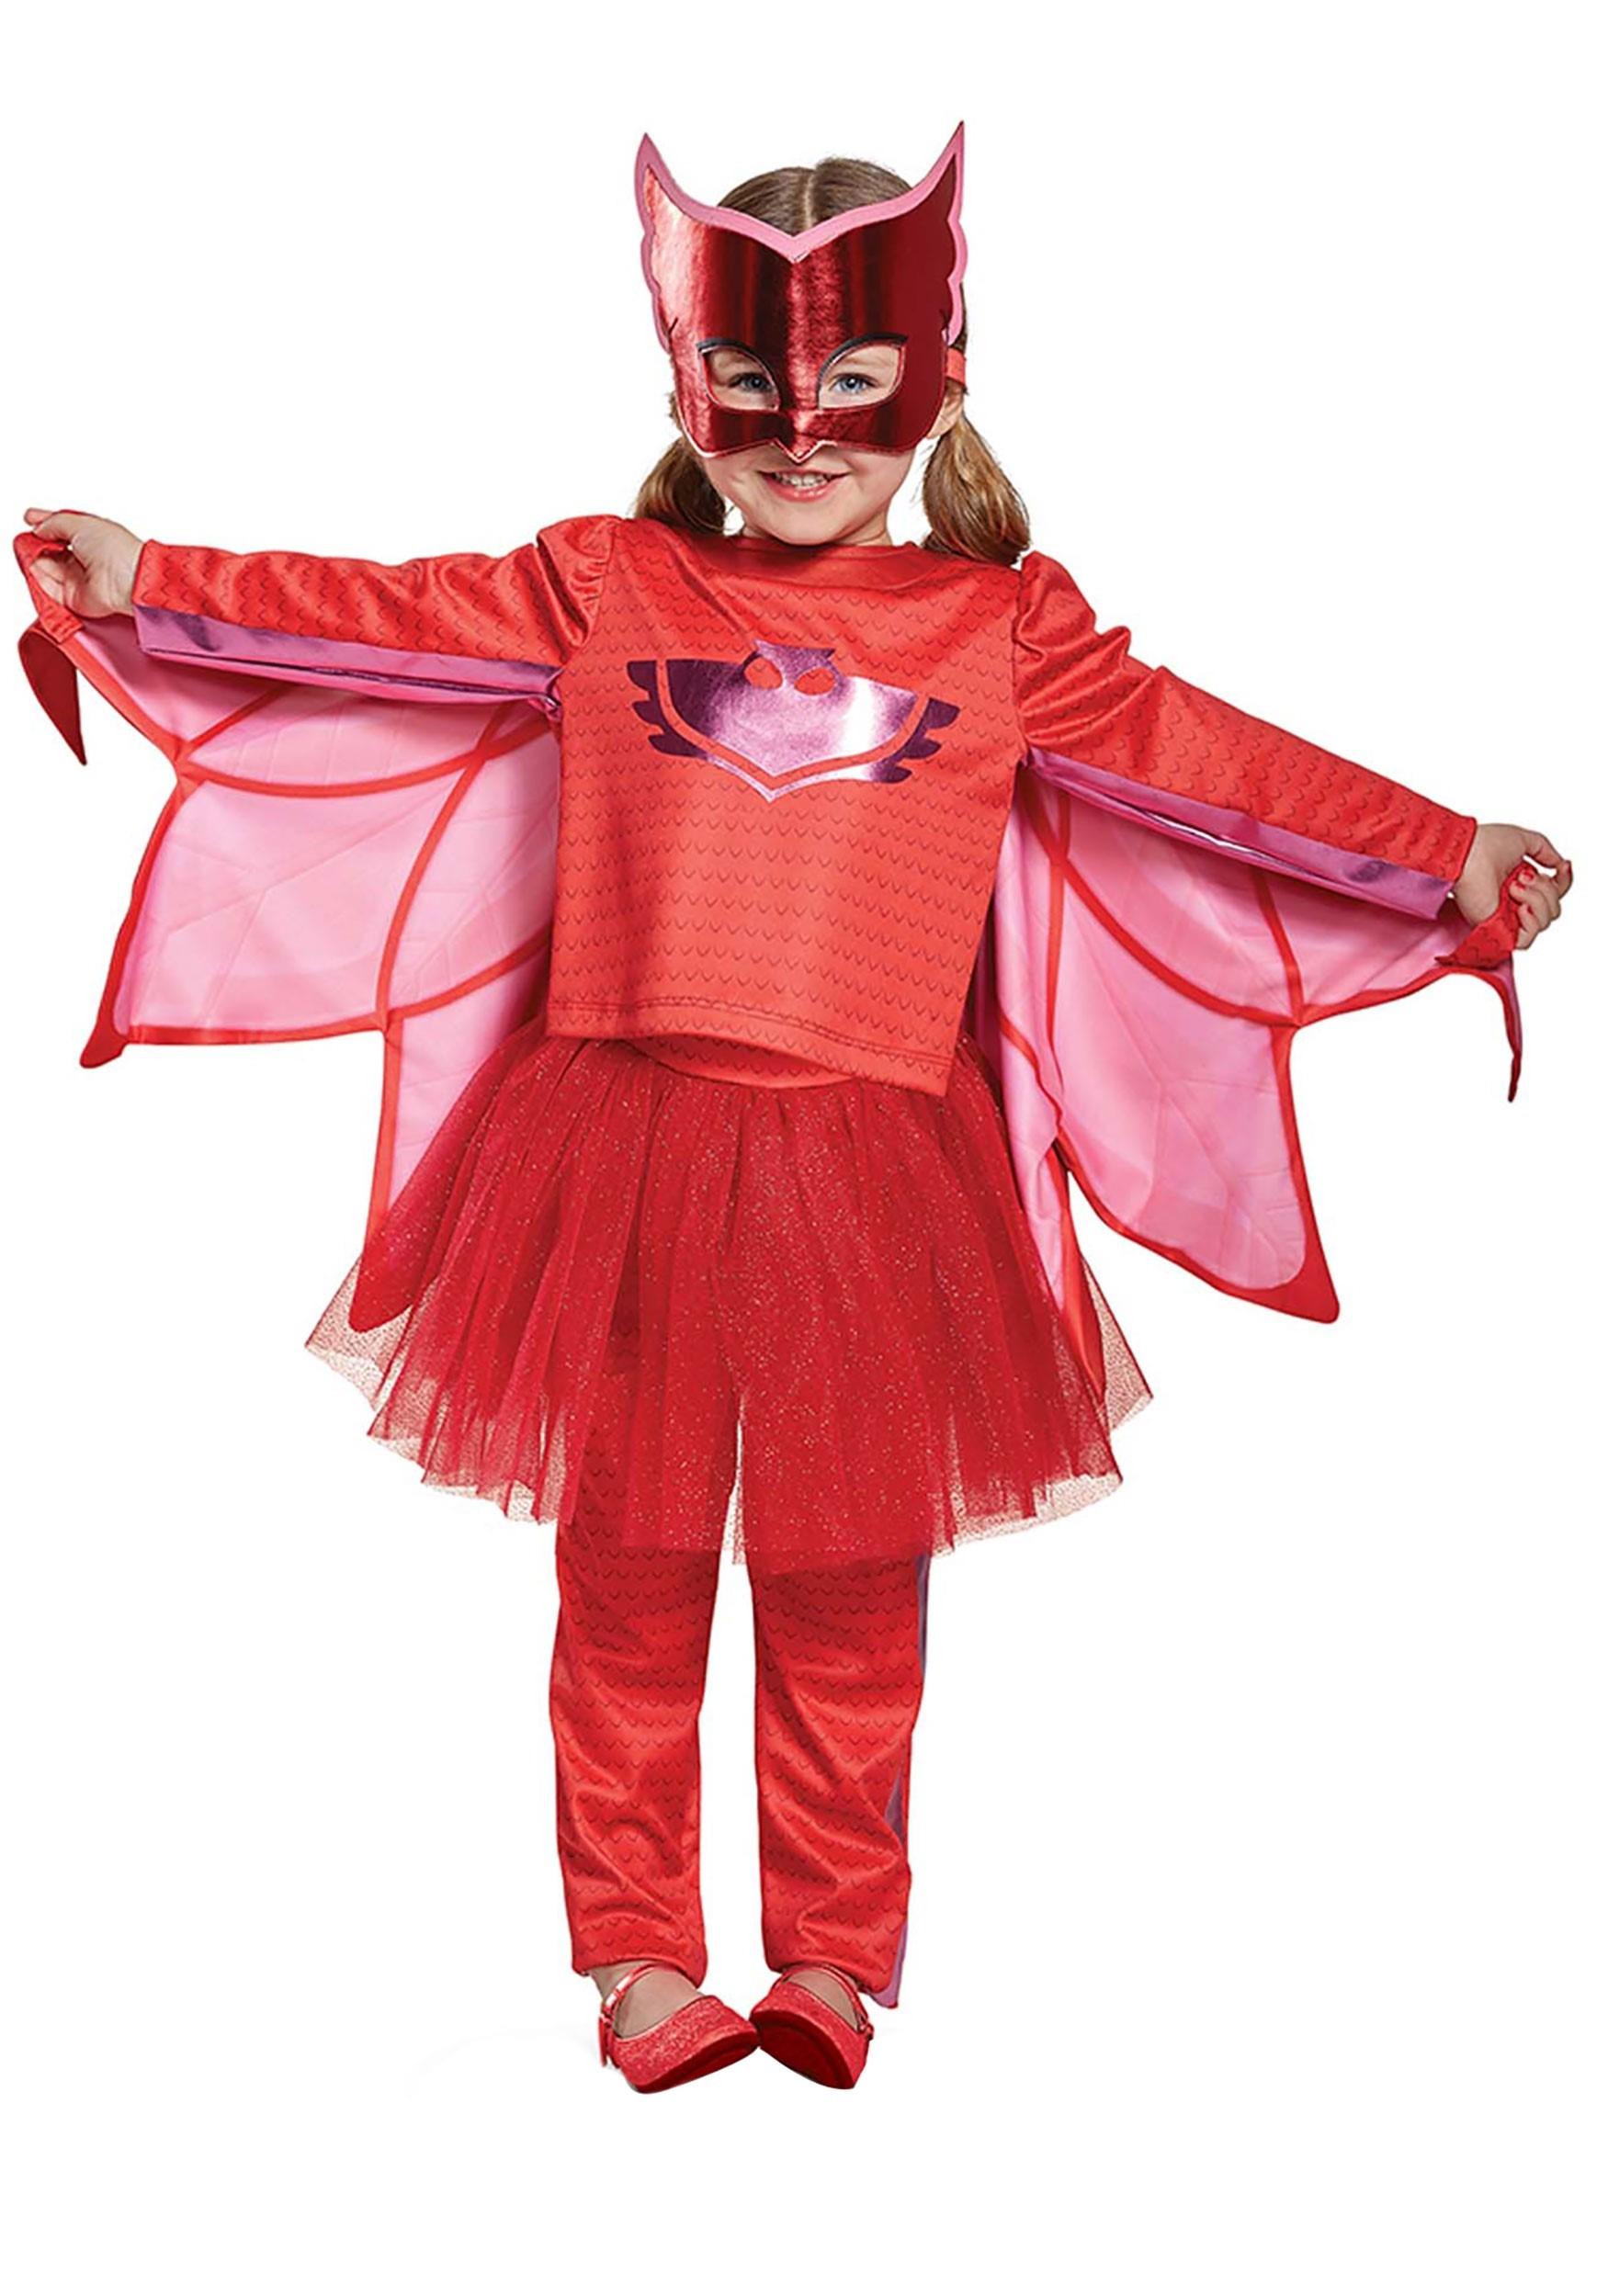 Pj Masks Owlette Prestige Tutu Costume For Toddler Girls